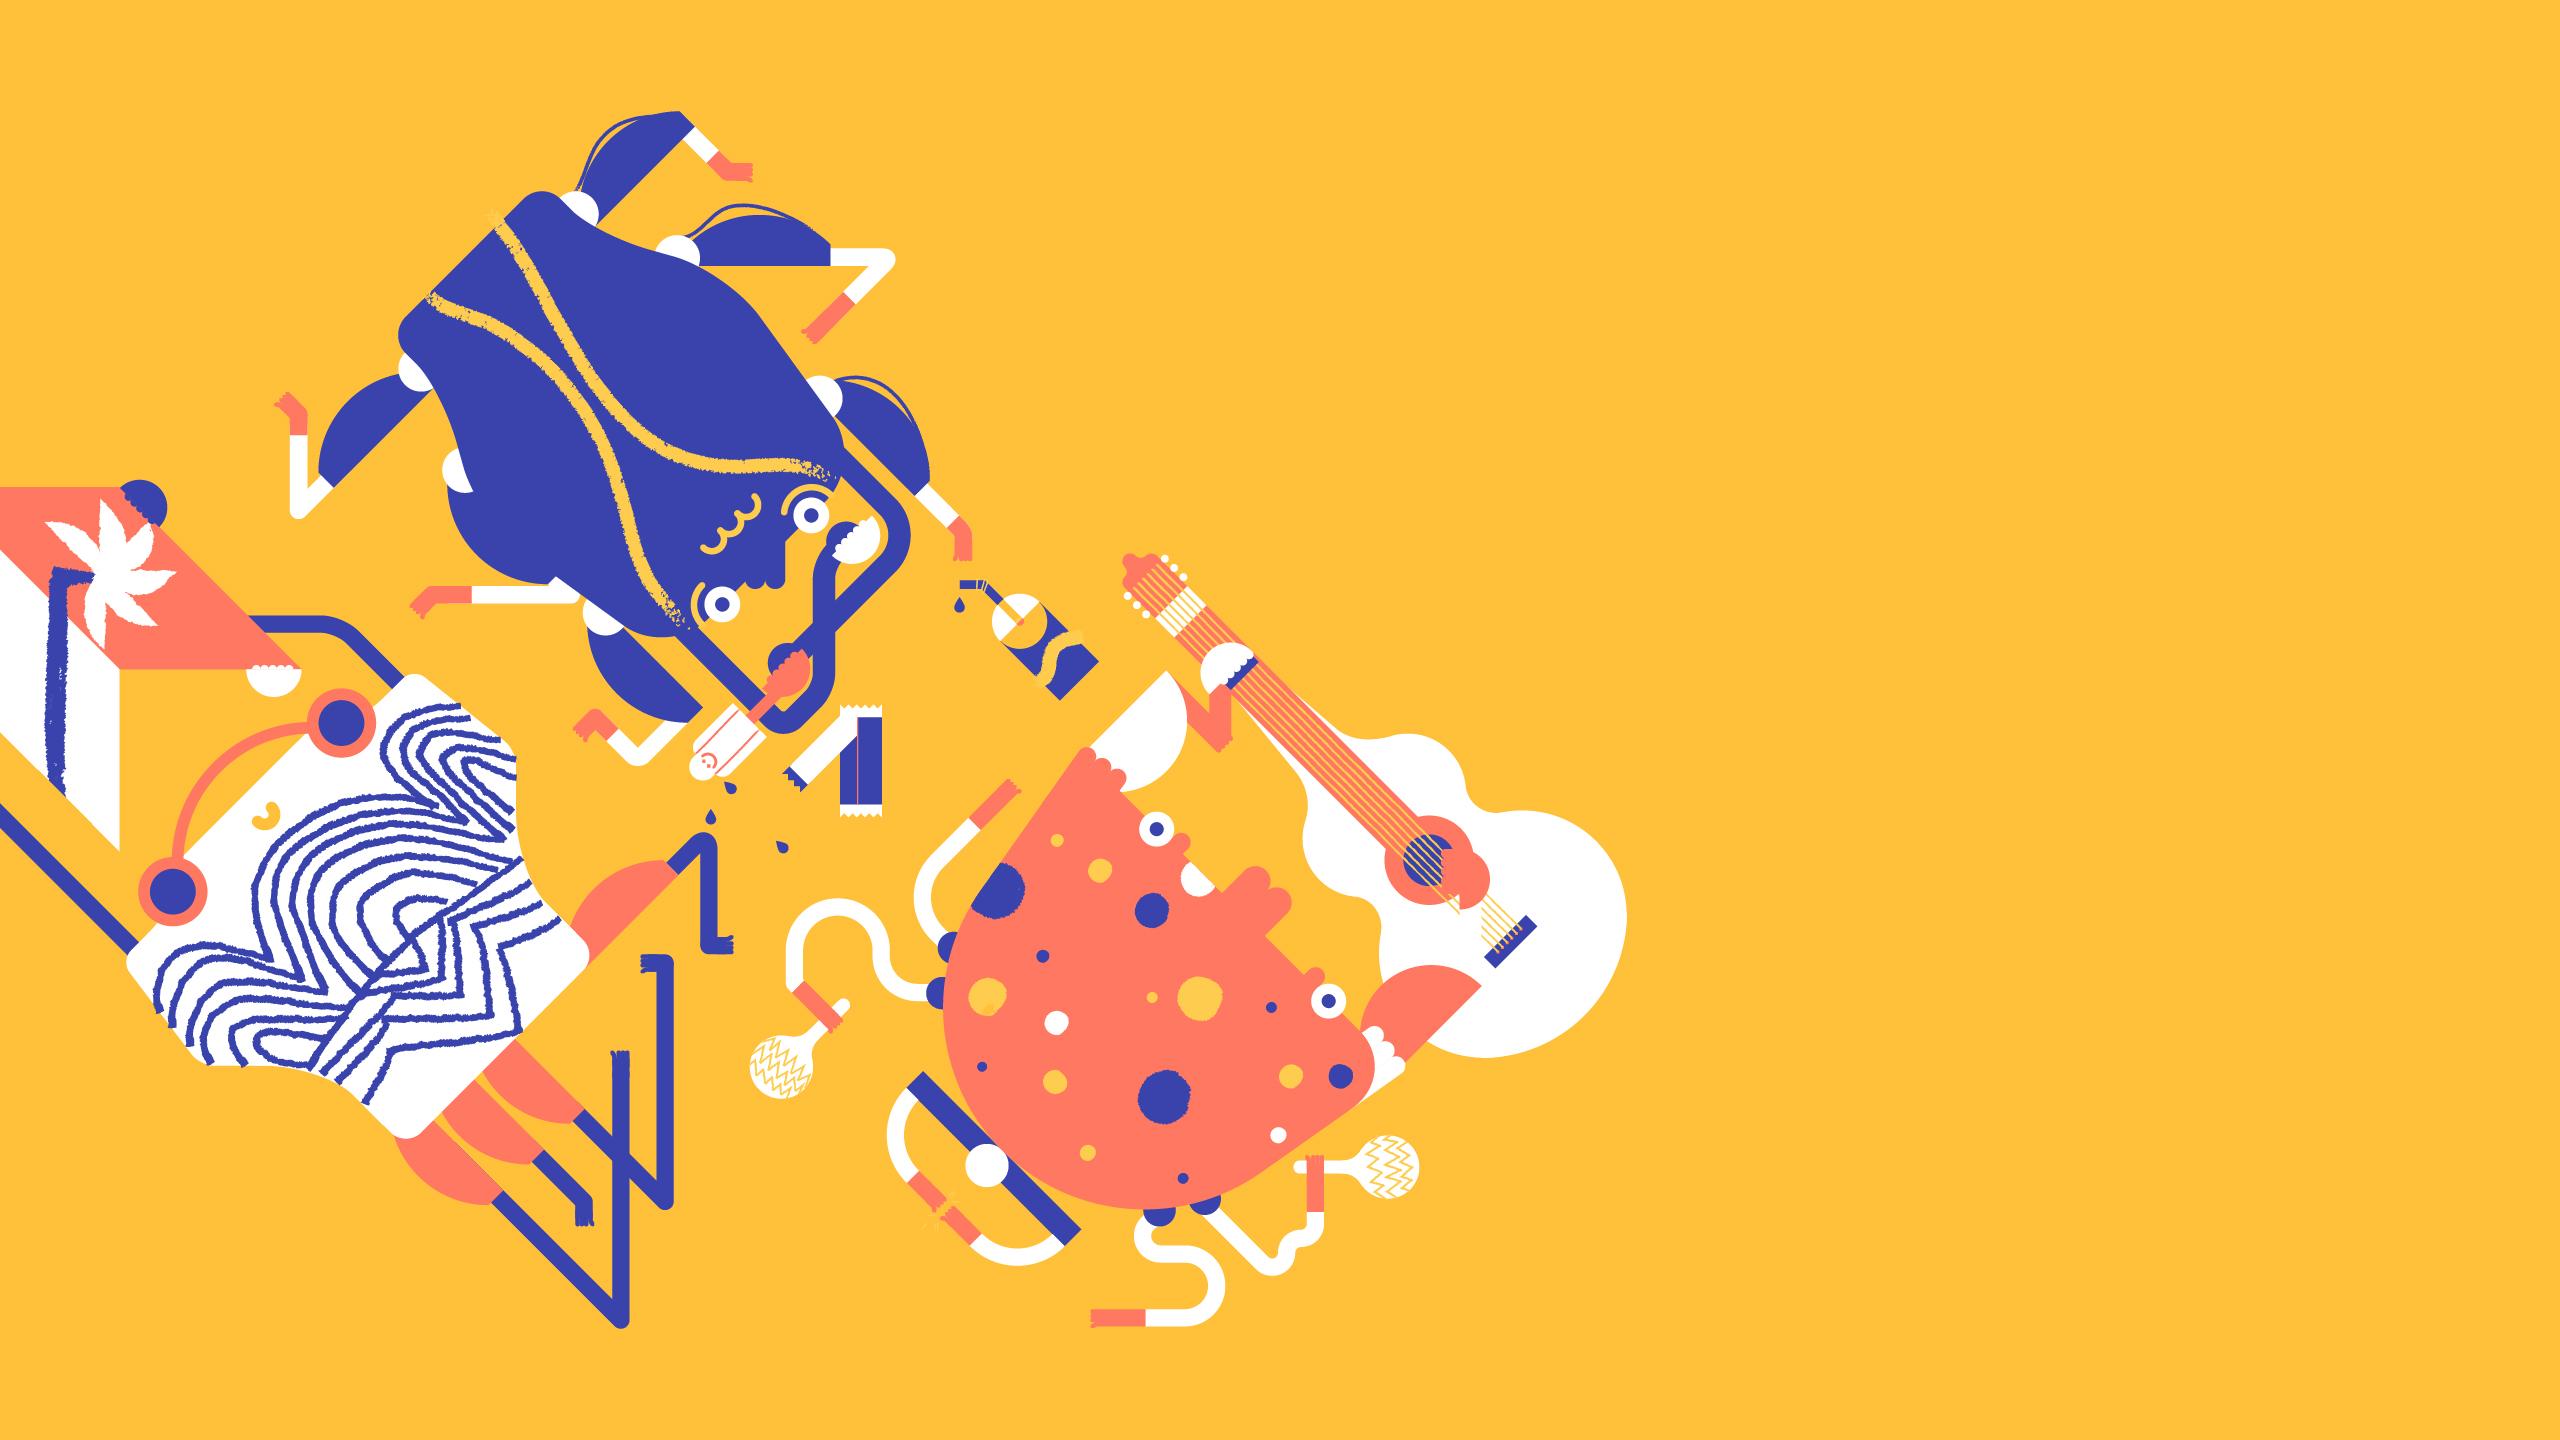 Artsy Desktop Backgrounds - WallpaperPulse